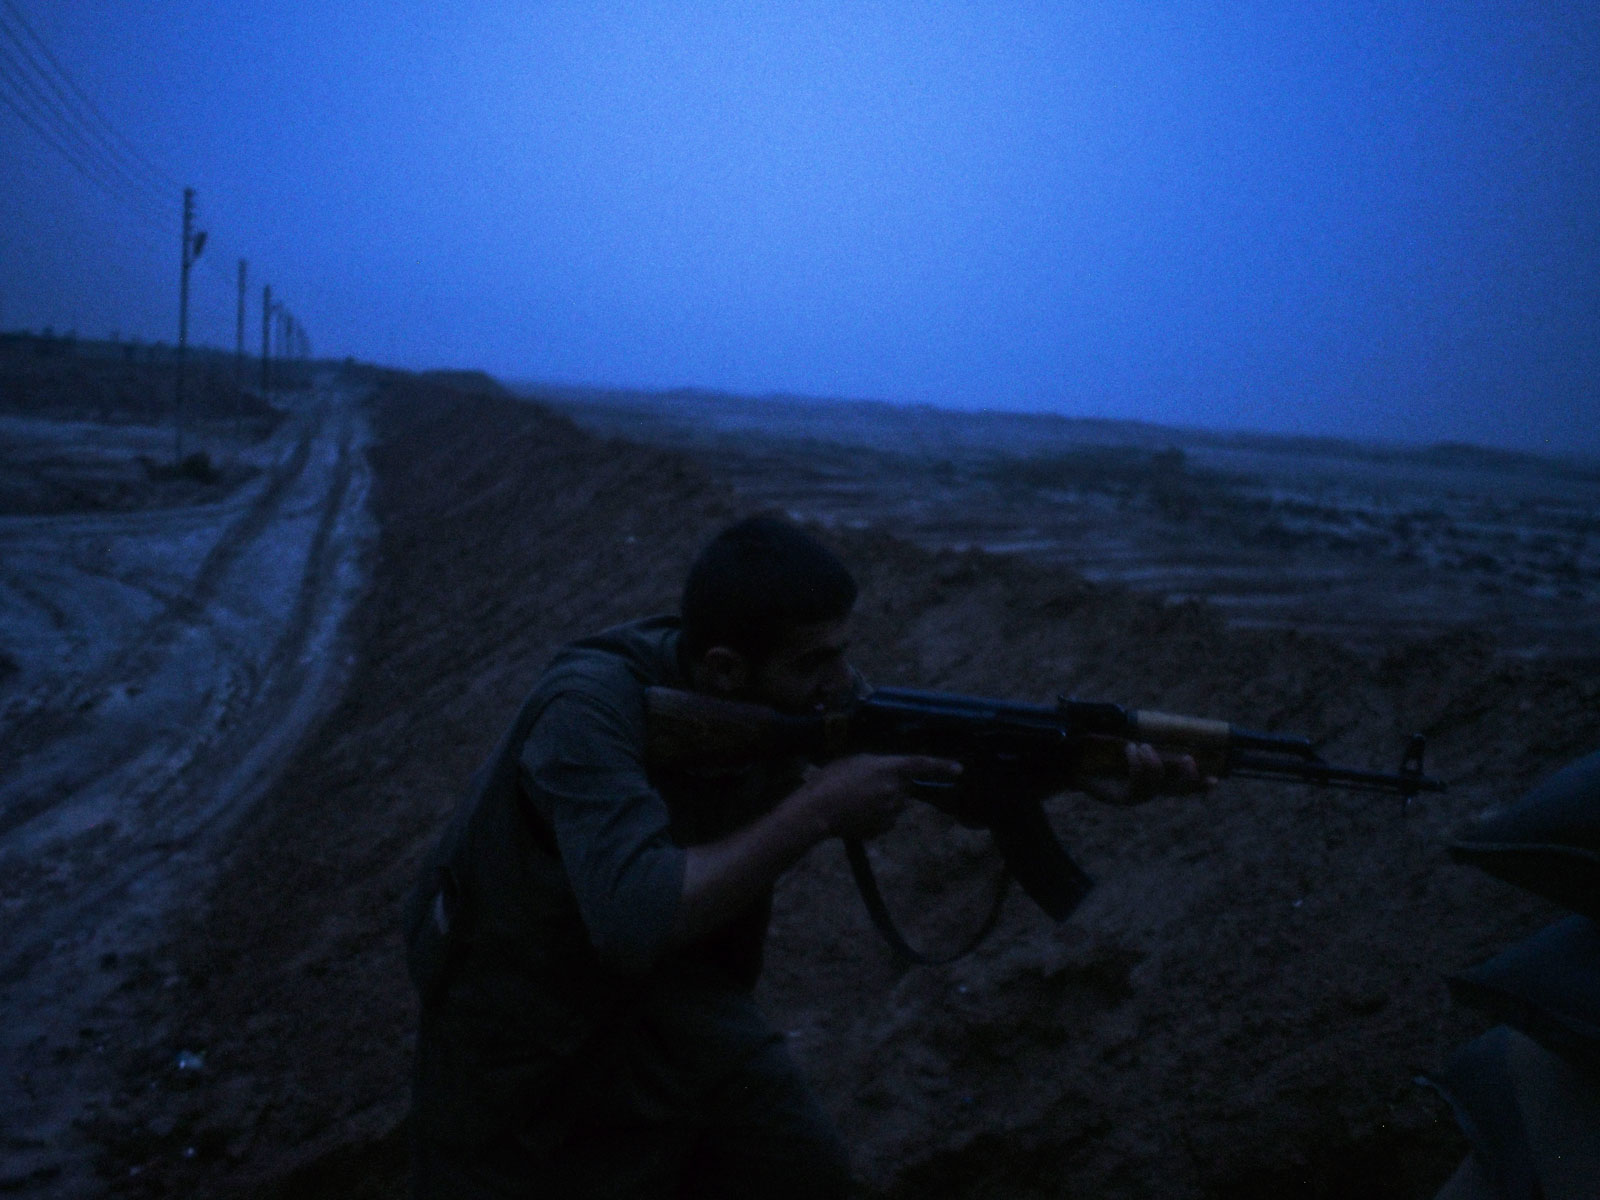 A Kurdish PKK fighter aiming his rifle at an Islamic State position, Dokuk, Iraq, December 3, 2014